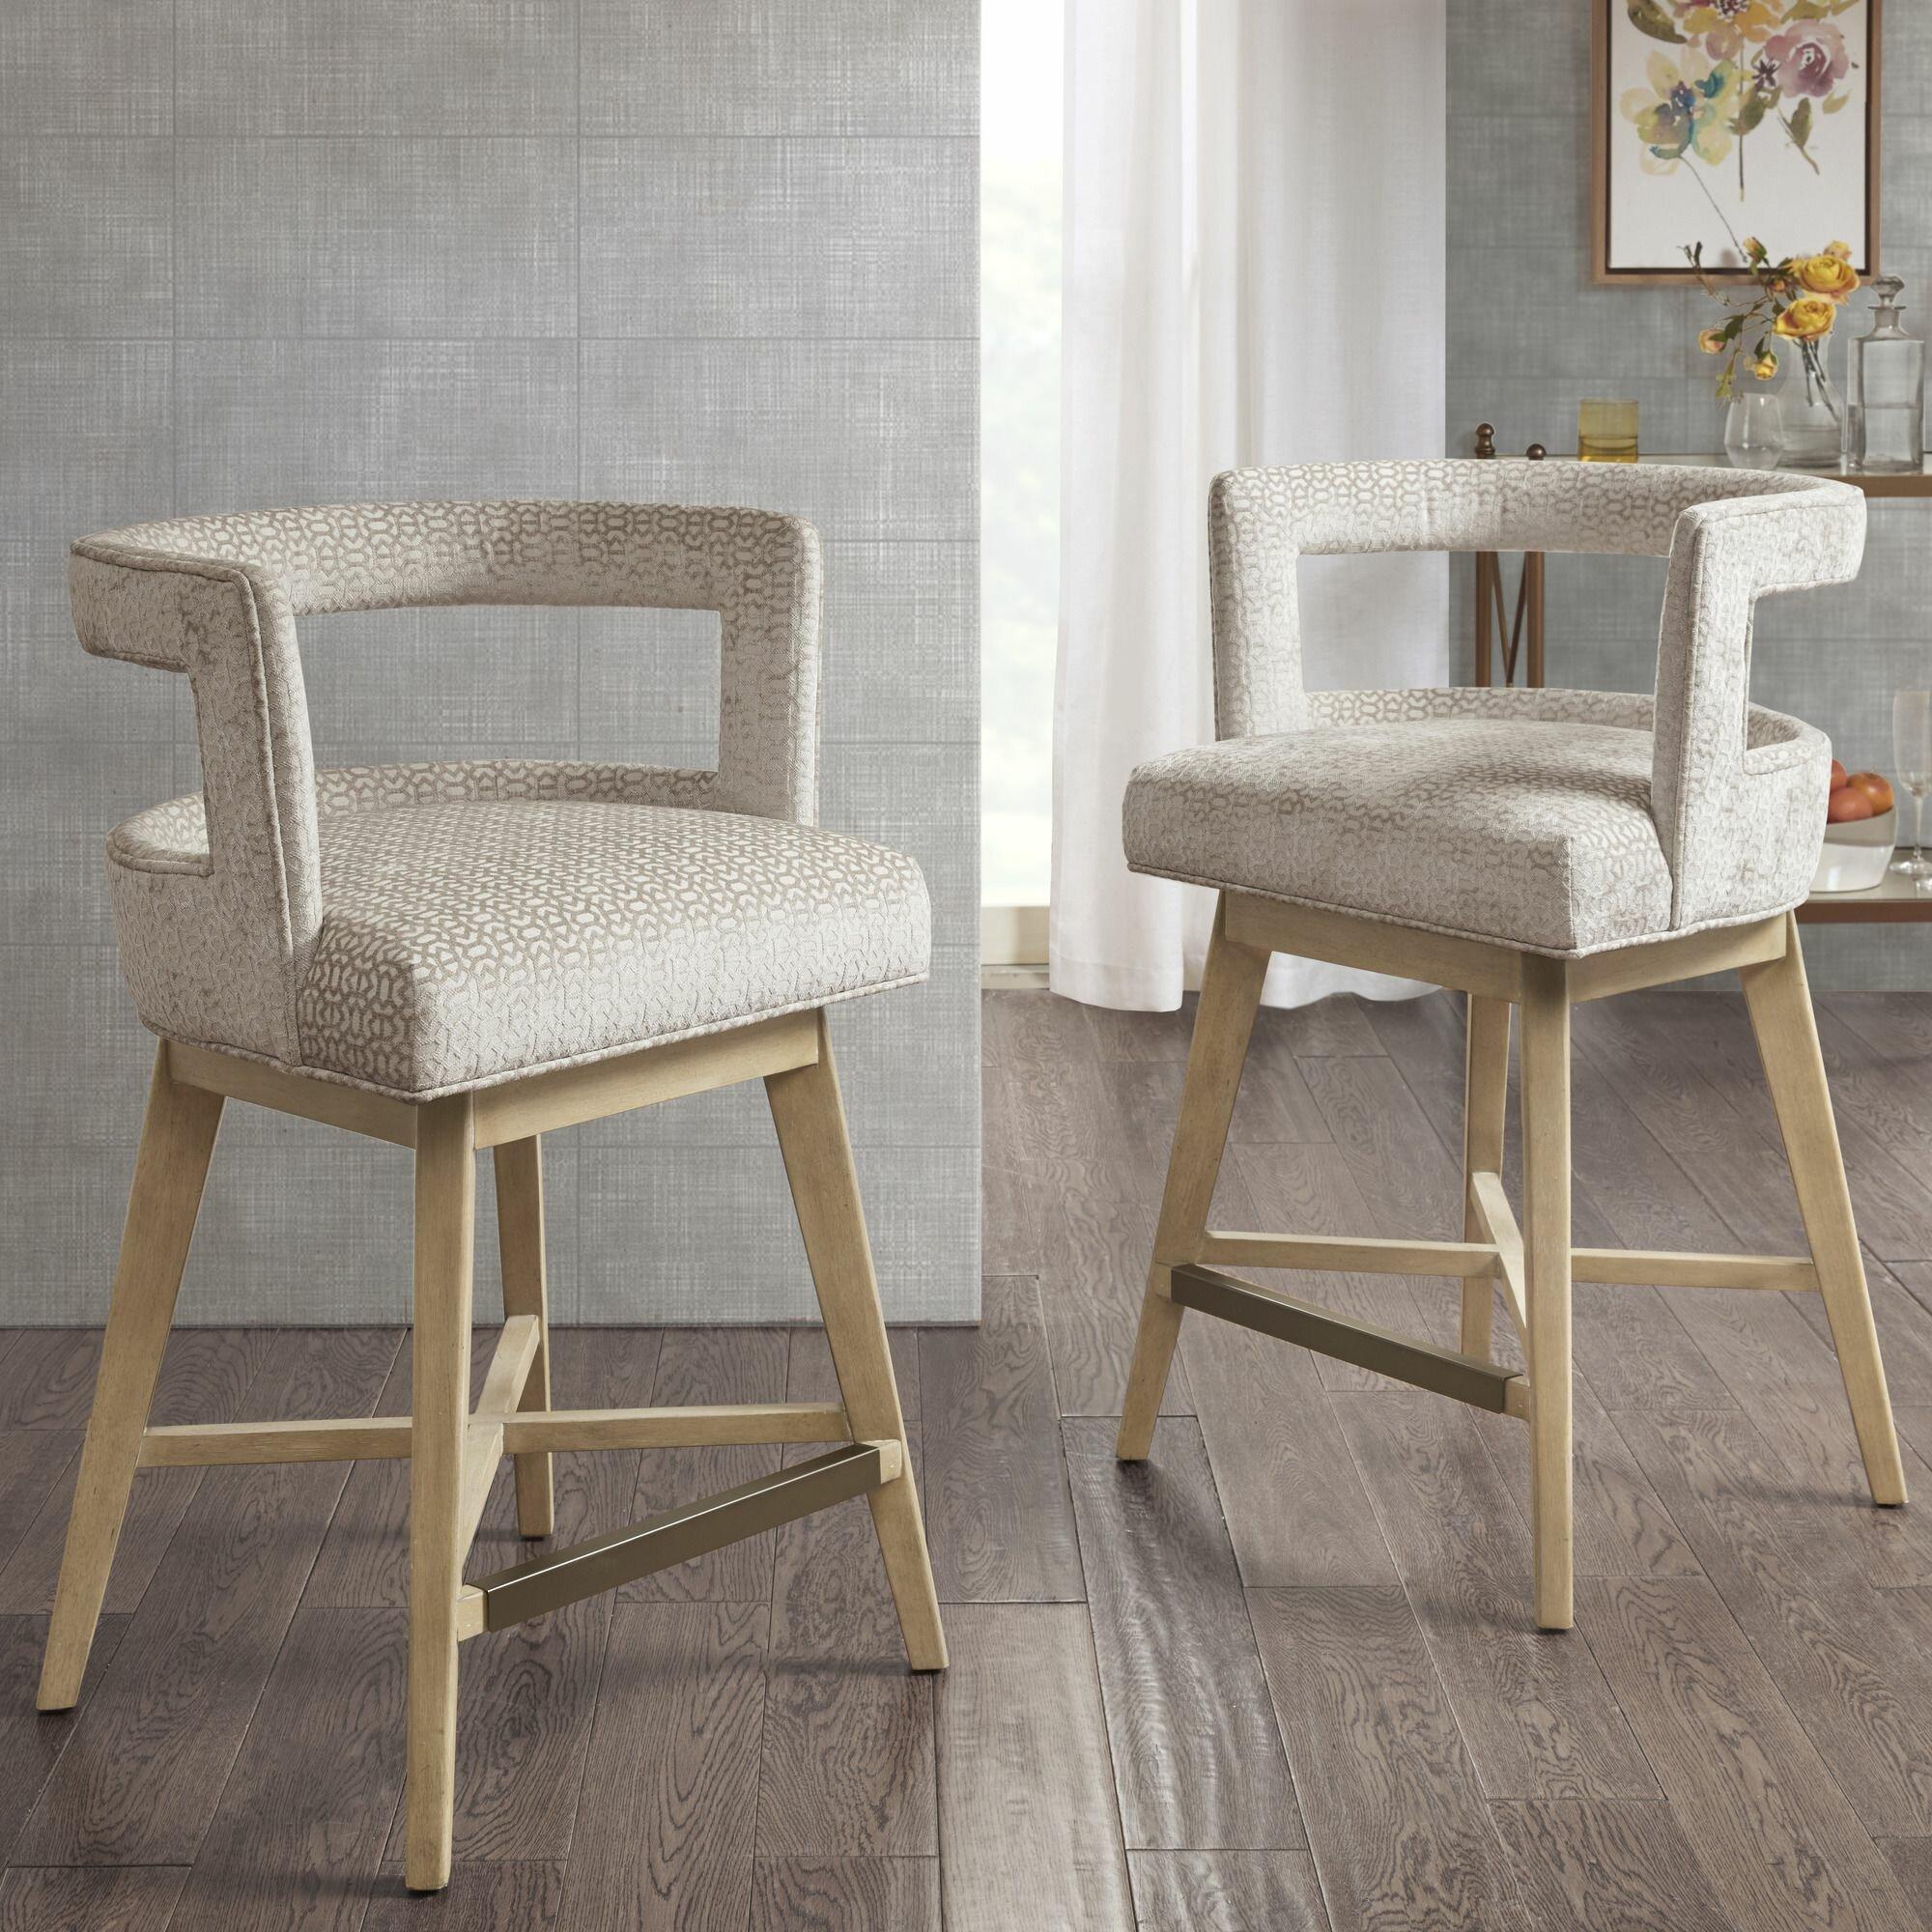 Fantastic Tuck Counter 25 Swivel Bar Stool Lamtechconsult Wood Chair Design Ideas Lamtechconsultcom